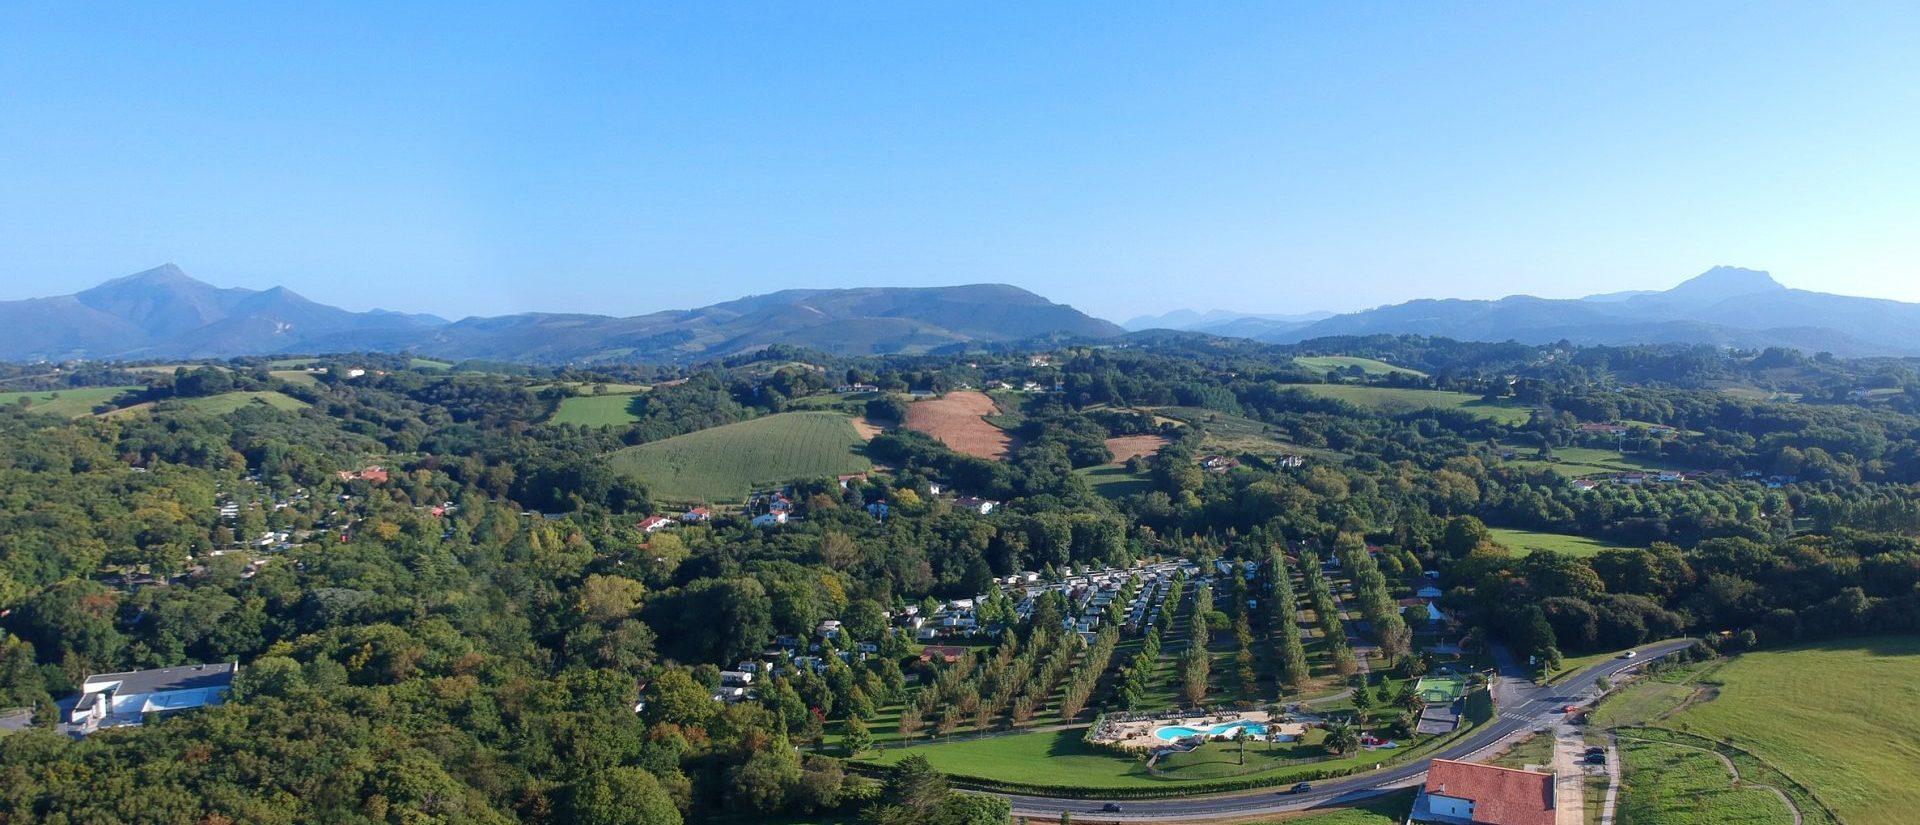 Camping Hendaye Eskualduna : Panorama sur les paysages environnants